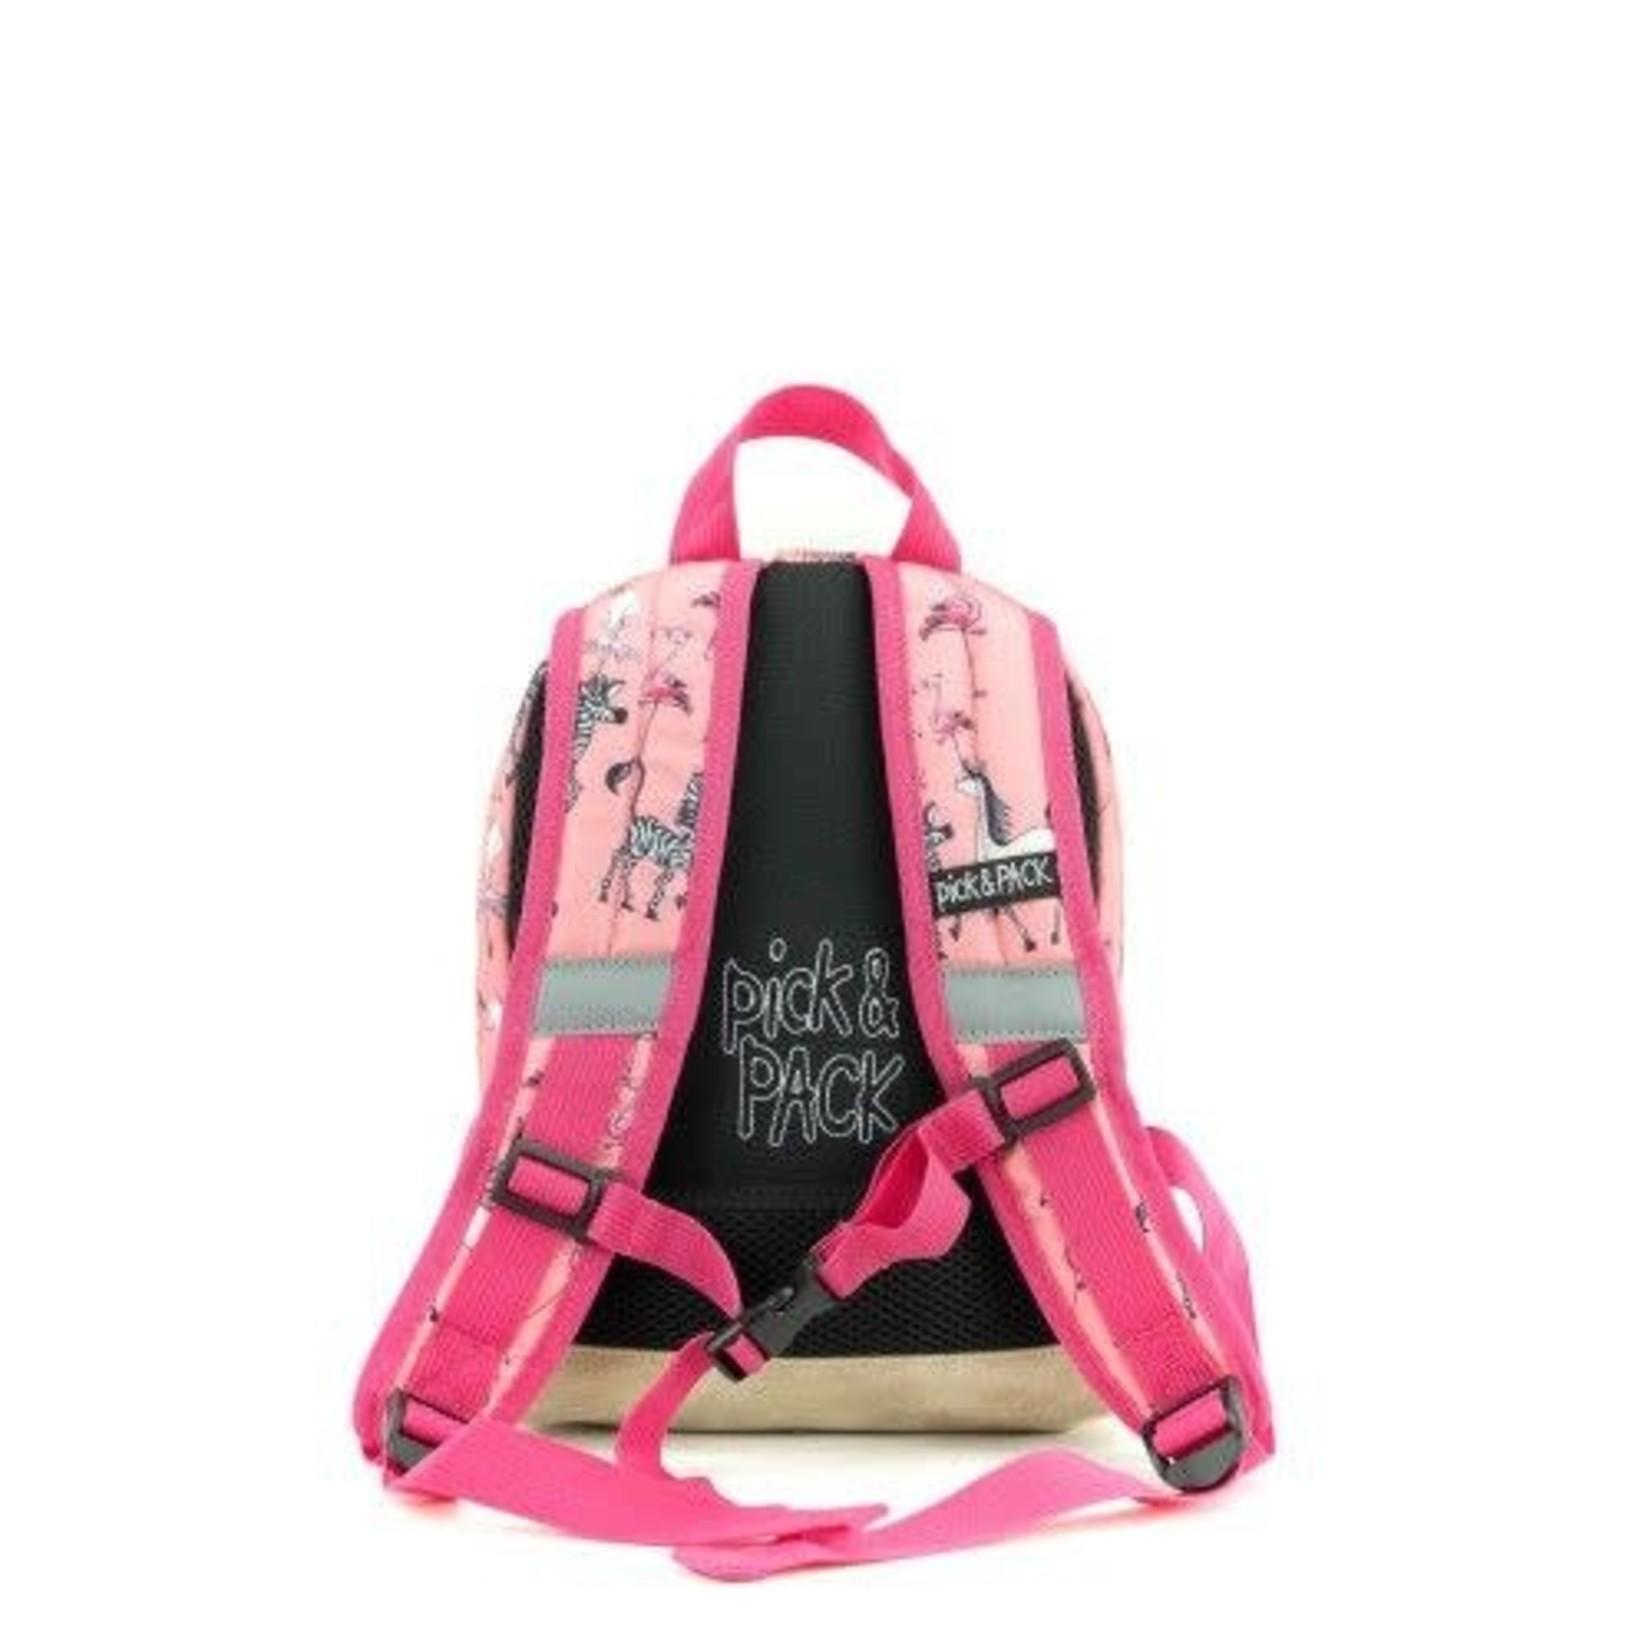 pick & pack PICK & PACK Royal Princess PINK